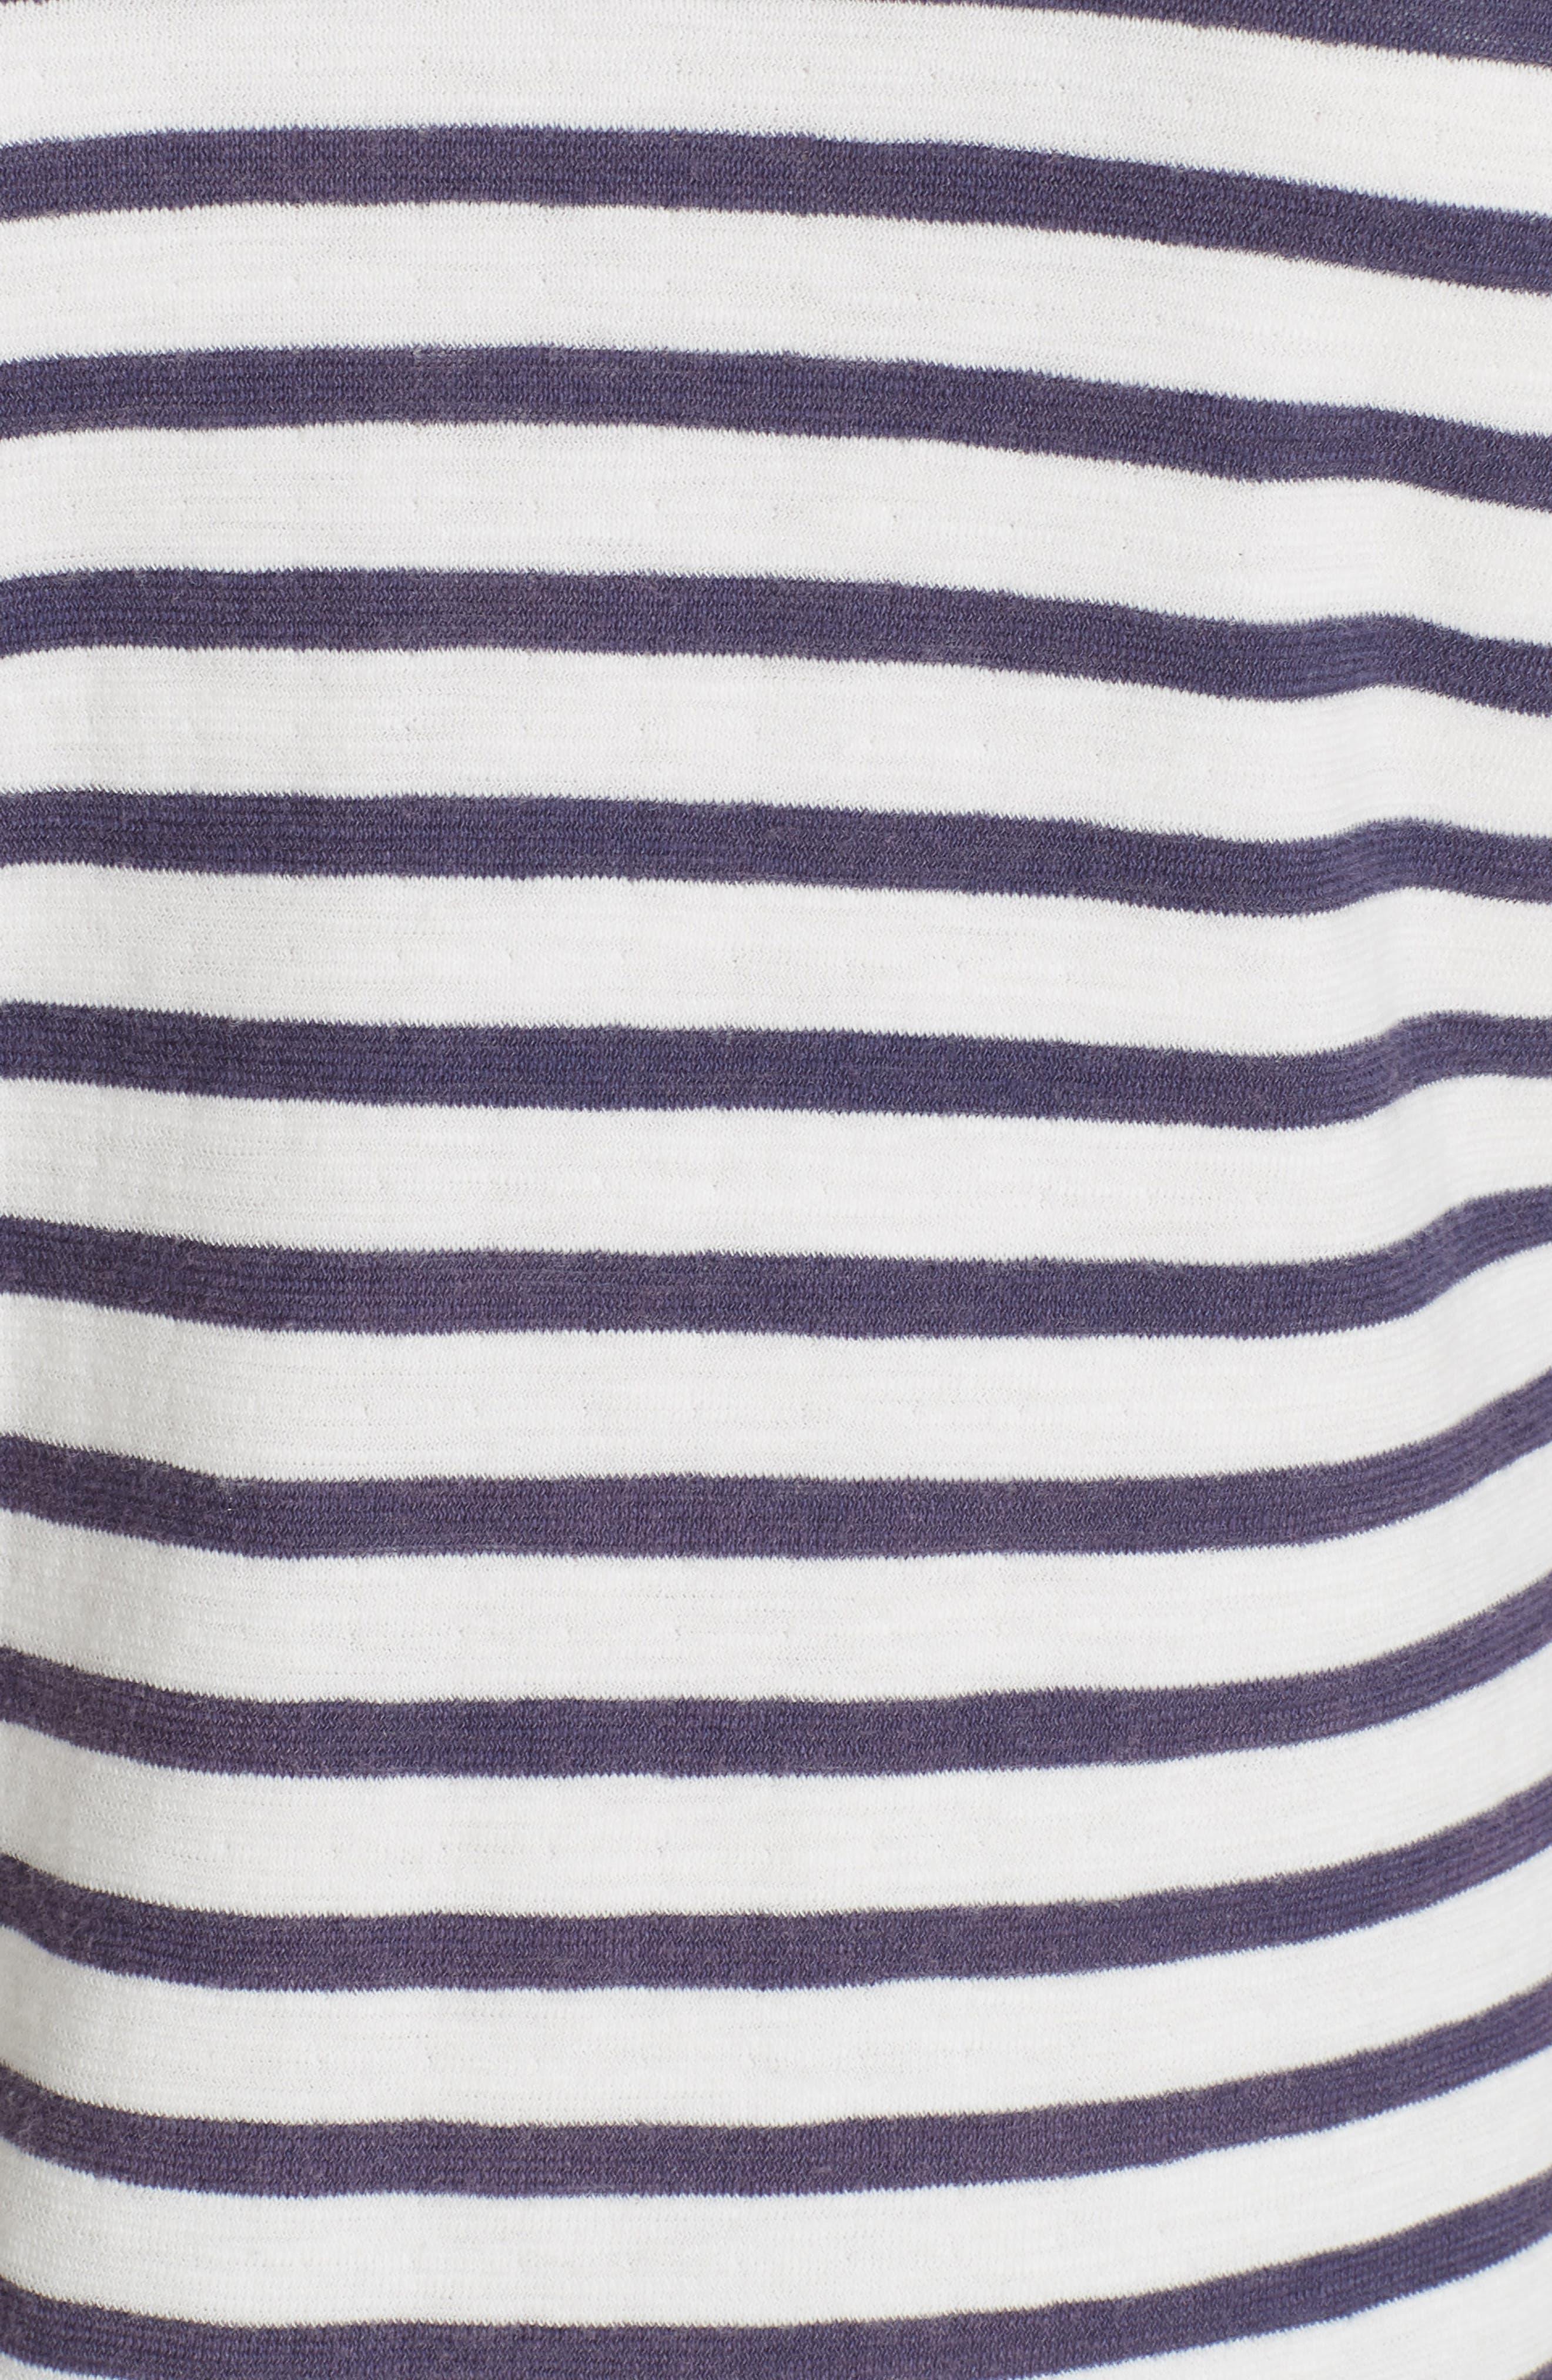 Stripe Top,                             Alternate thumbnail 5, color,                             DECK WASH WHITE/ FLAG BLUE